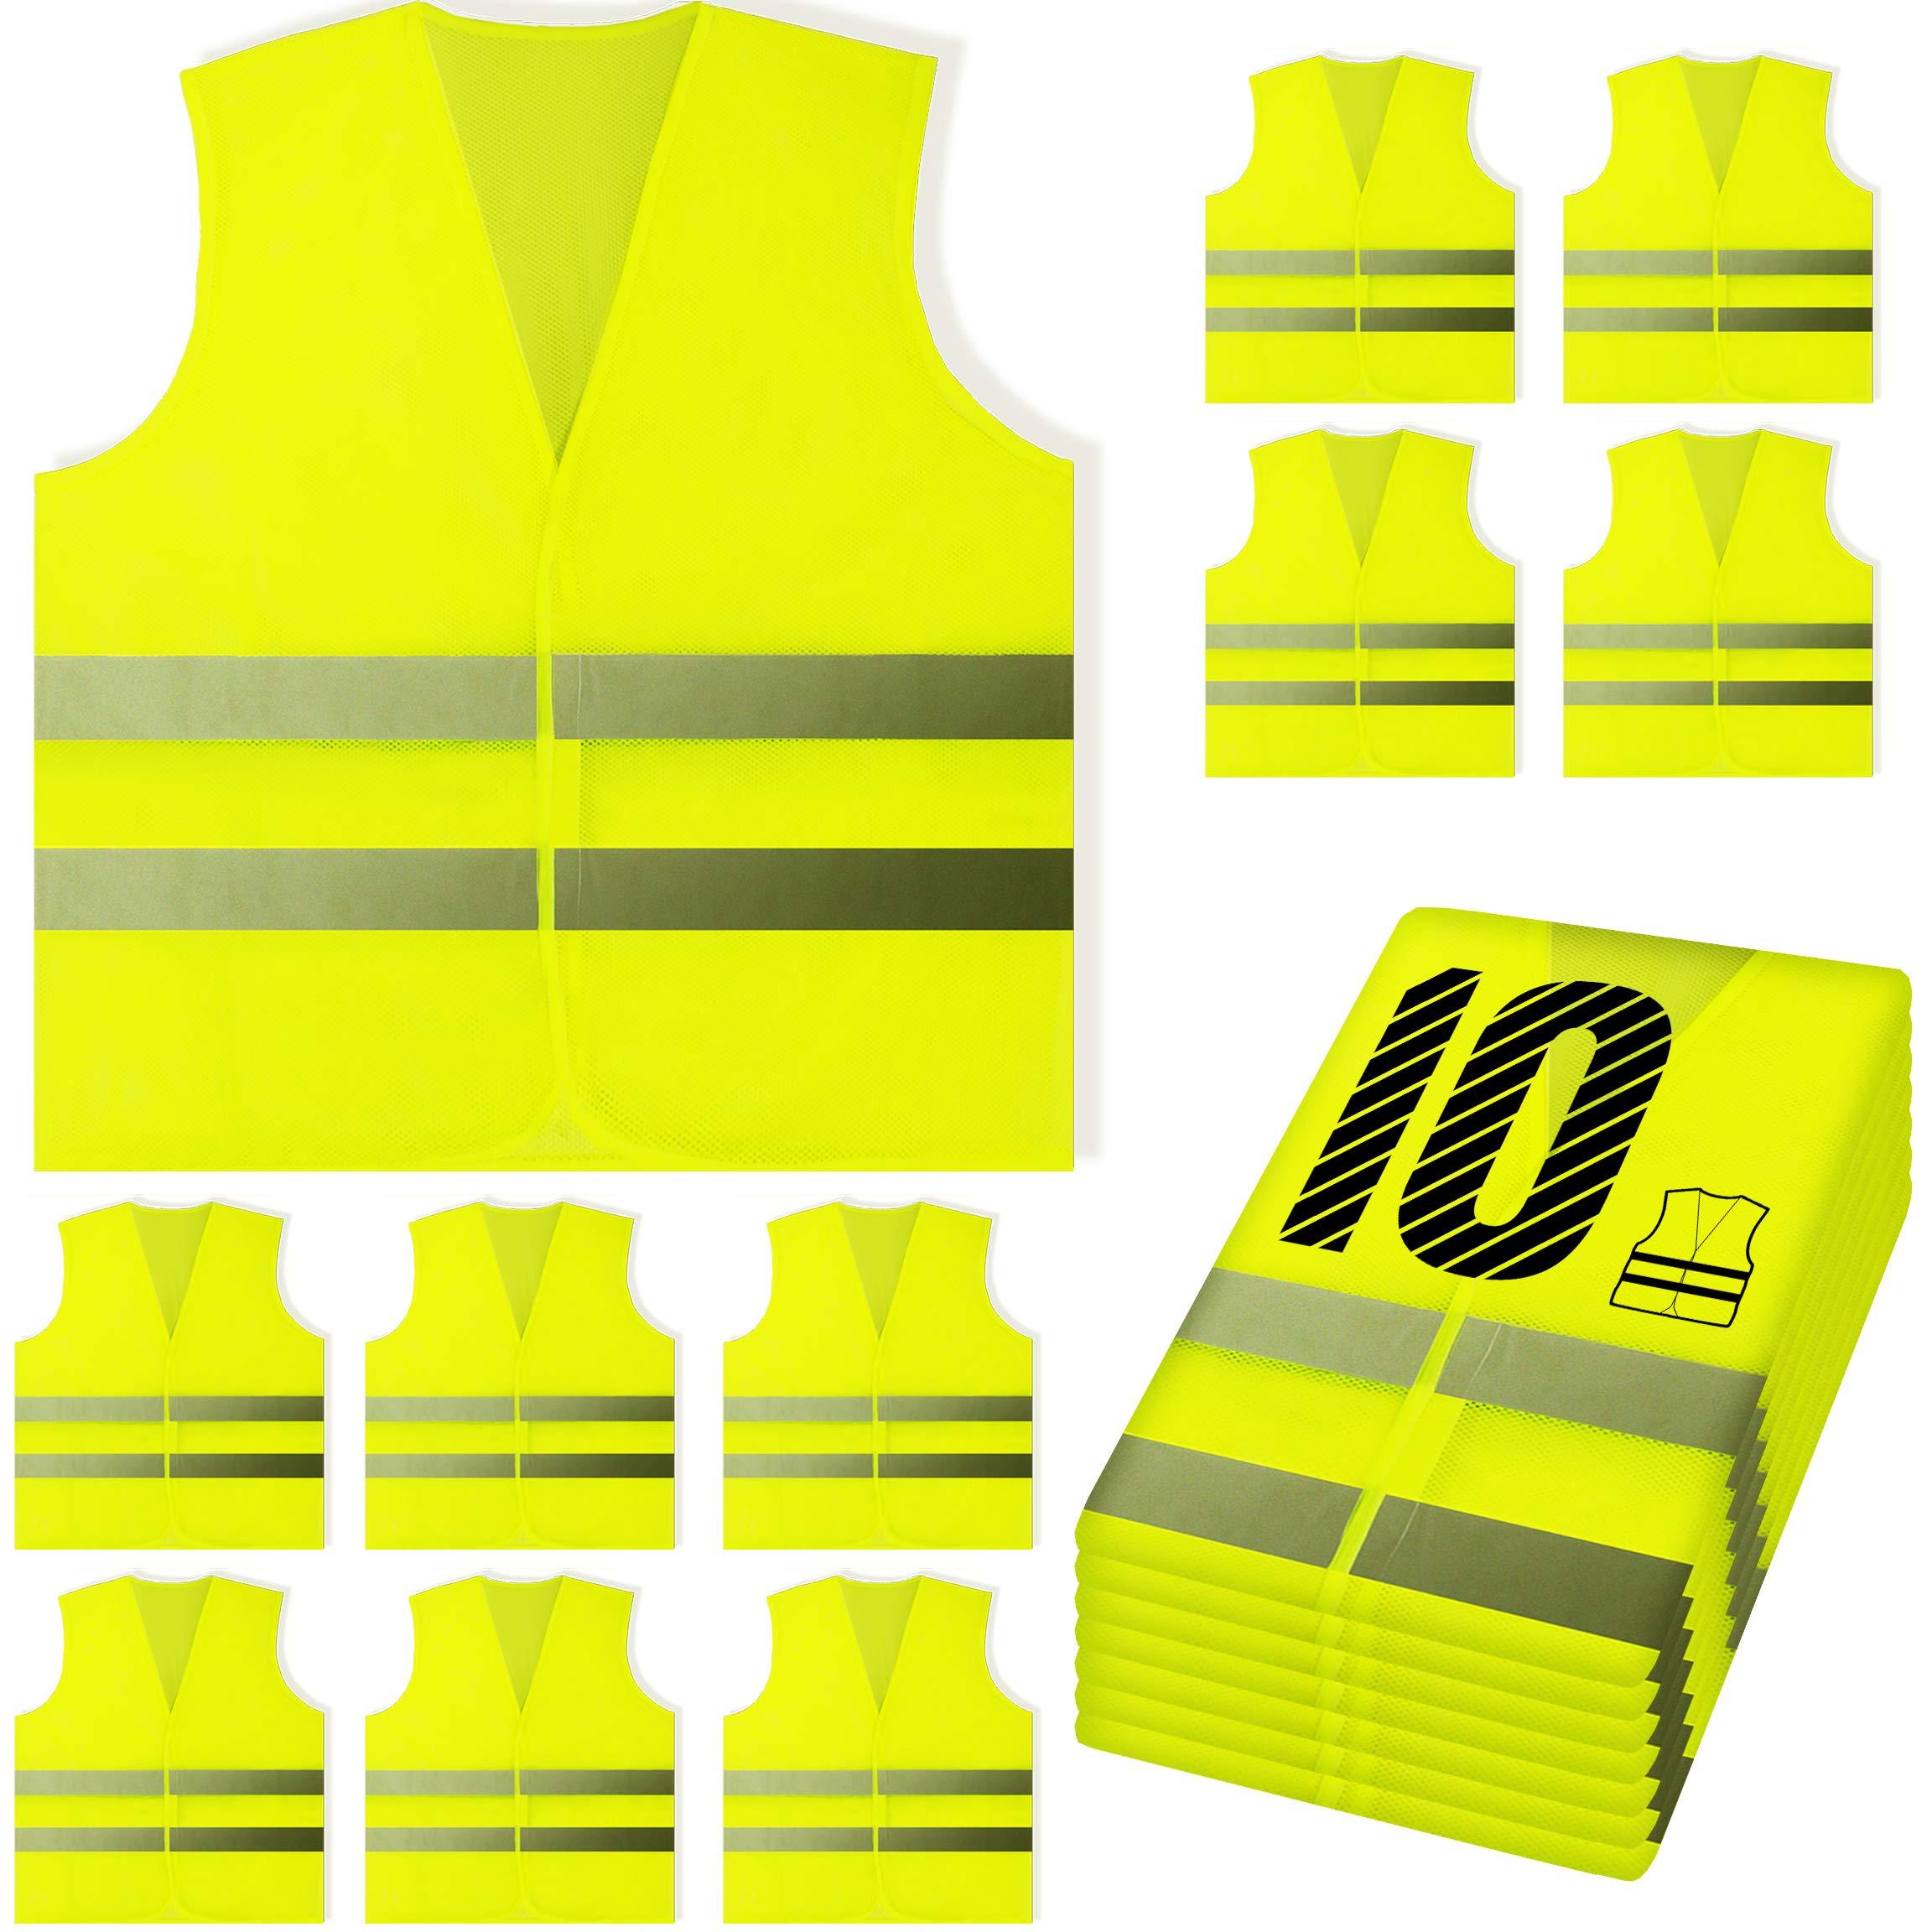 PeerBasics, 10 Pack, Yellow Reflective High Visibility Safety Vest, Hi Vis Silver Strip, Men & Women, Work, Cycling, Runner, Surveyor, Volunteer, Crossing Guard, Road, Construction, Neon (Mesh, 10) by PeerBasics